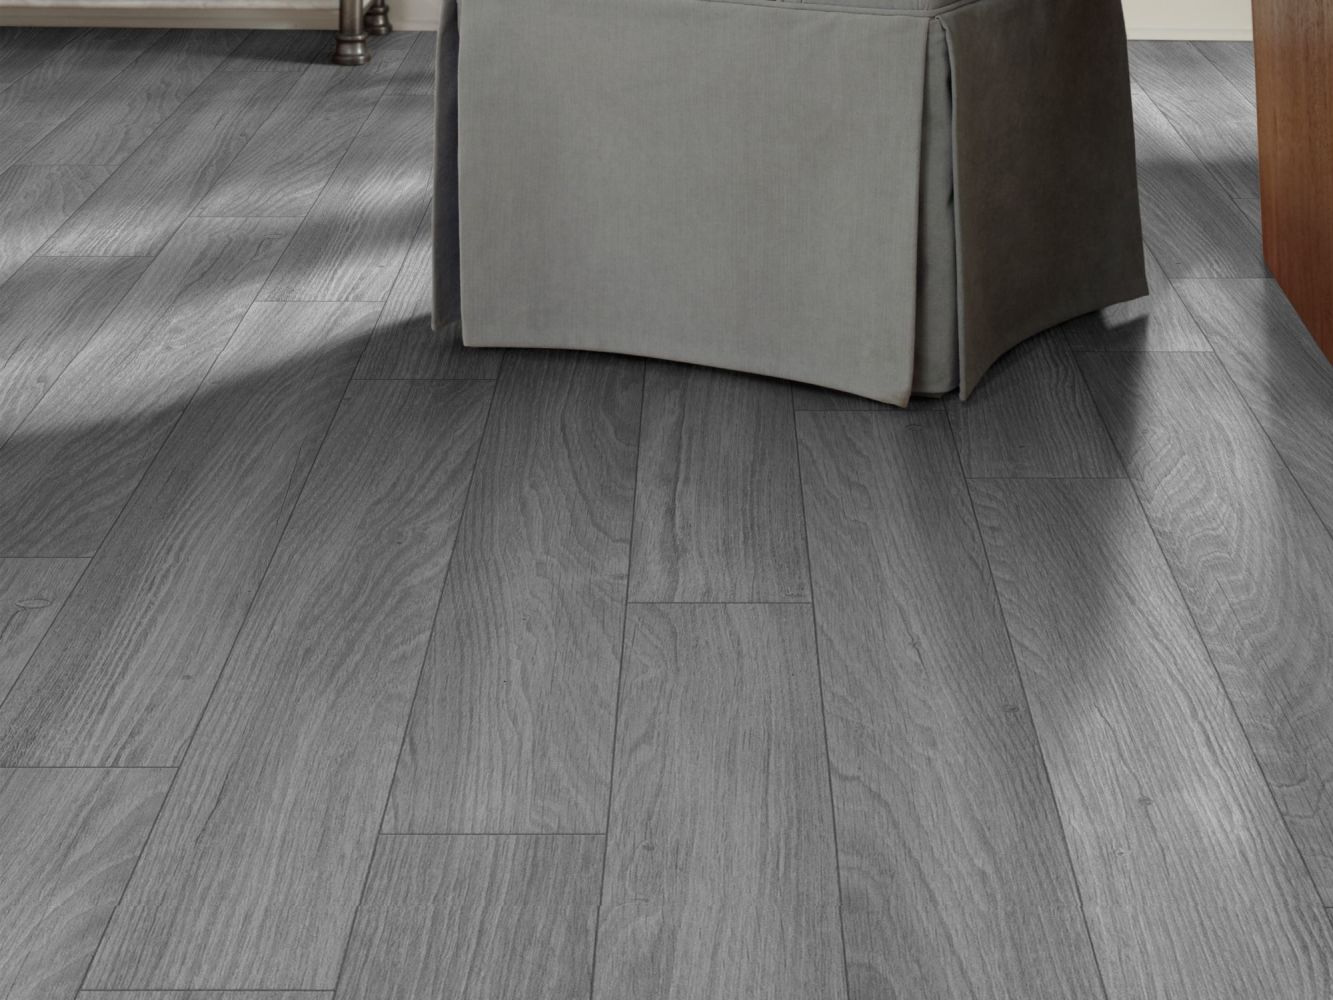 Shaw Floors Fischer Homes Westerfield II Shadow Grey 00557_FSH56